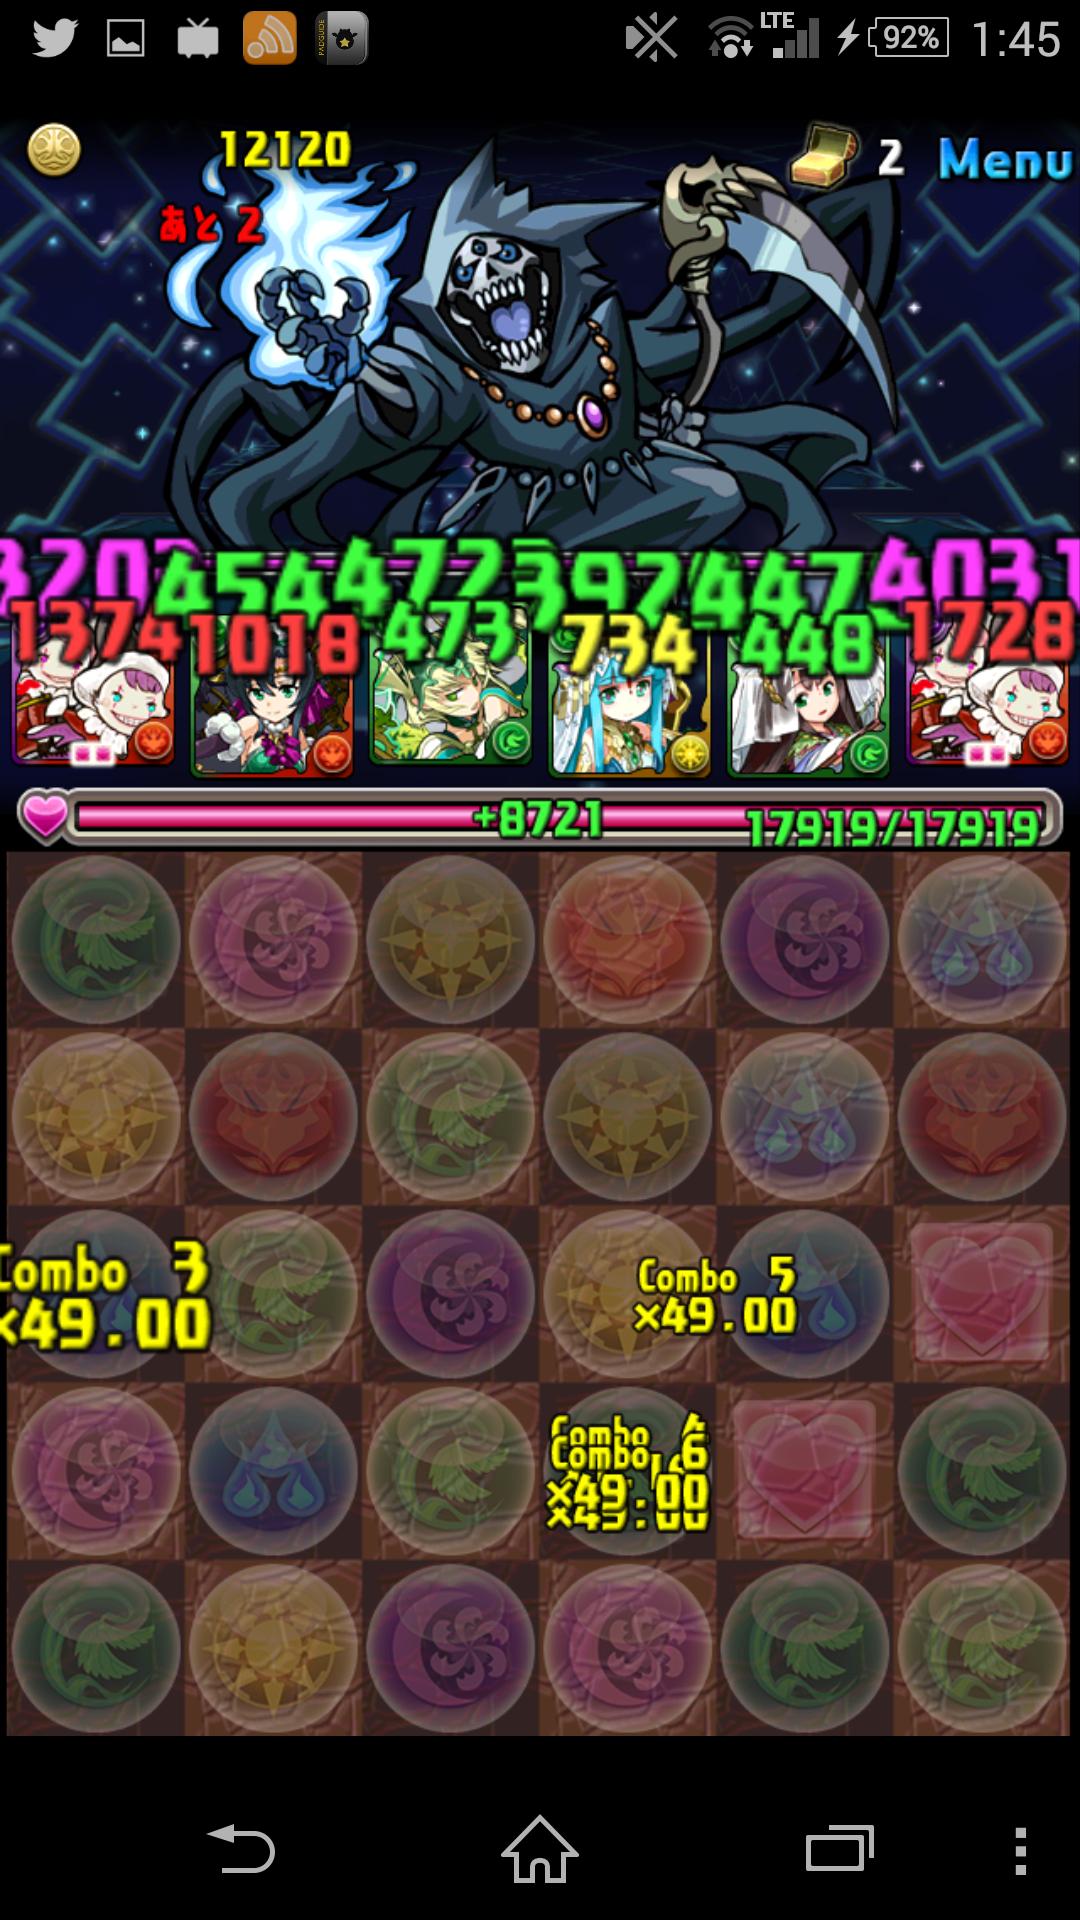 Screenshot_2015-03-04-01-45-49.png